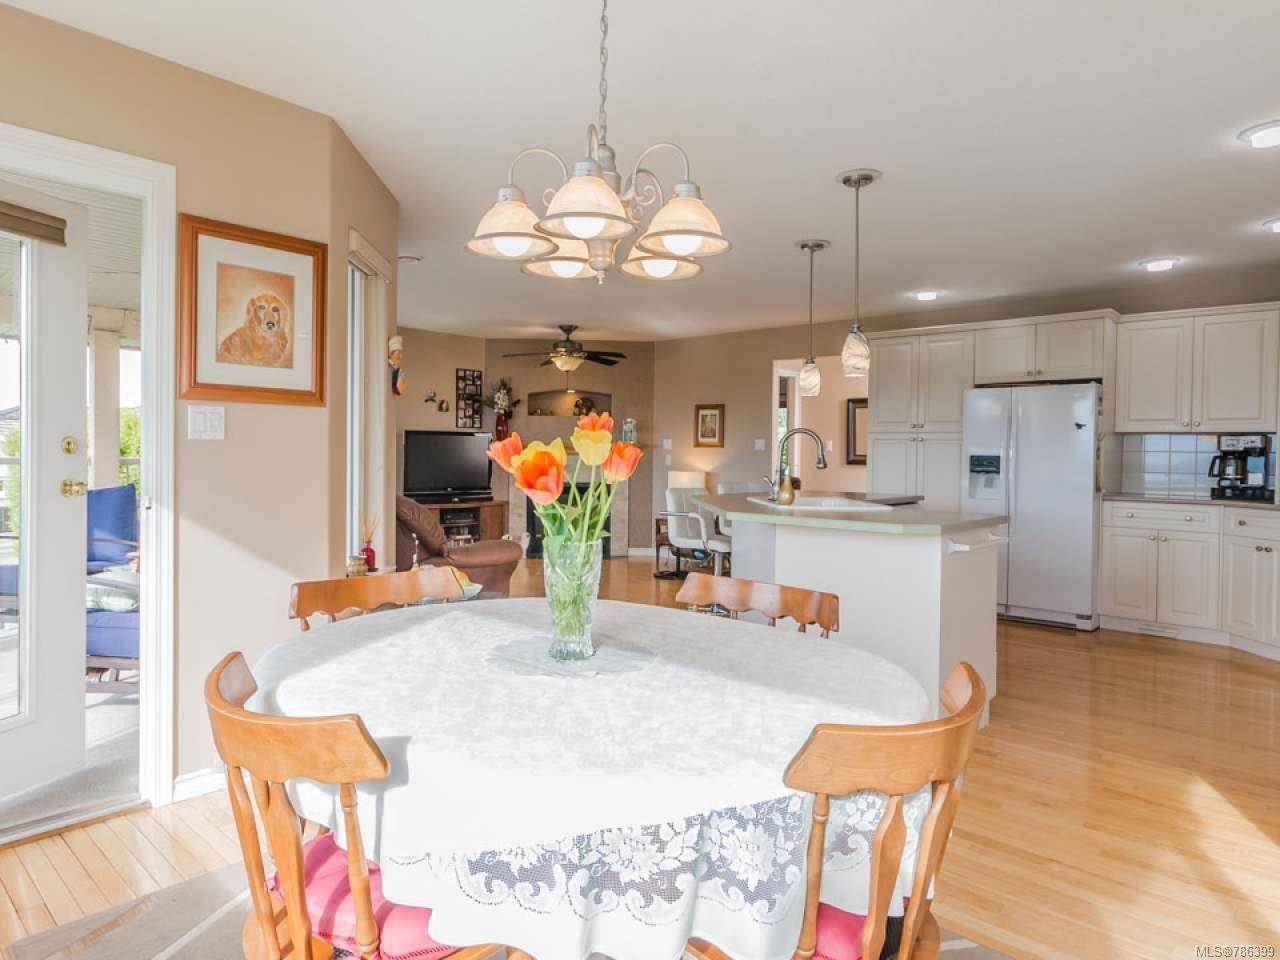 Photo 7: Photos: 5371 HIGHRIDGE PLACE in NANAIMO: Na North Nanaimo House for sale (Nanaimo)  : MLS®# 786399